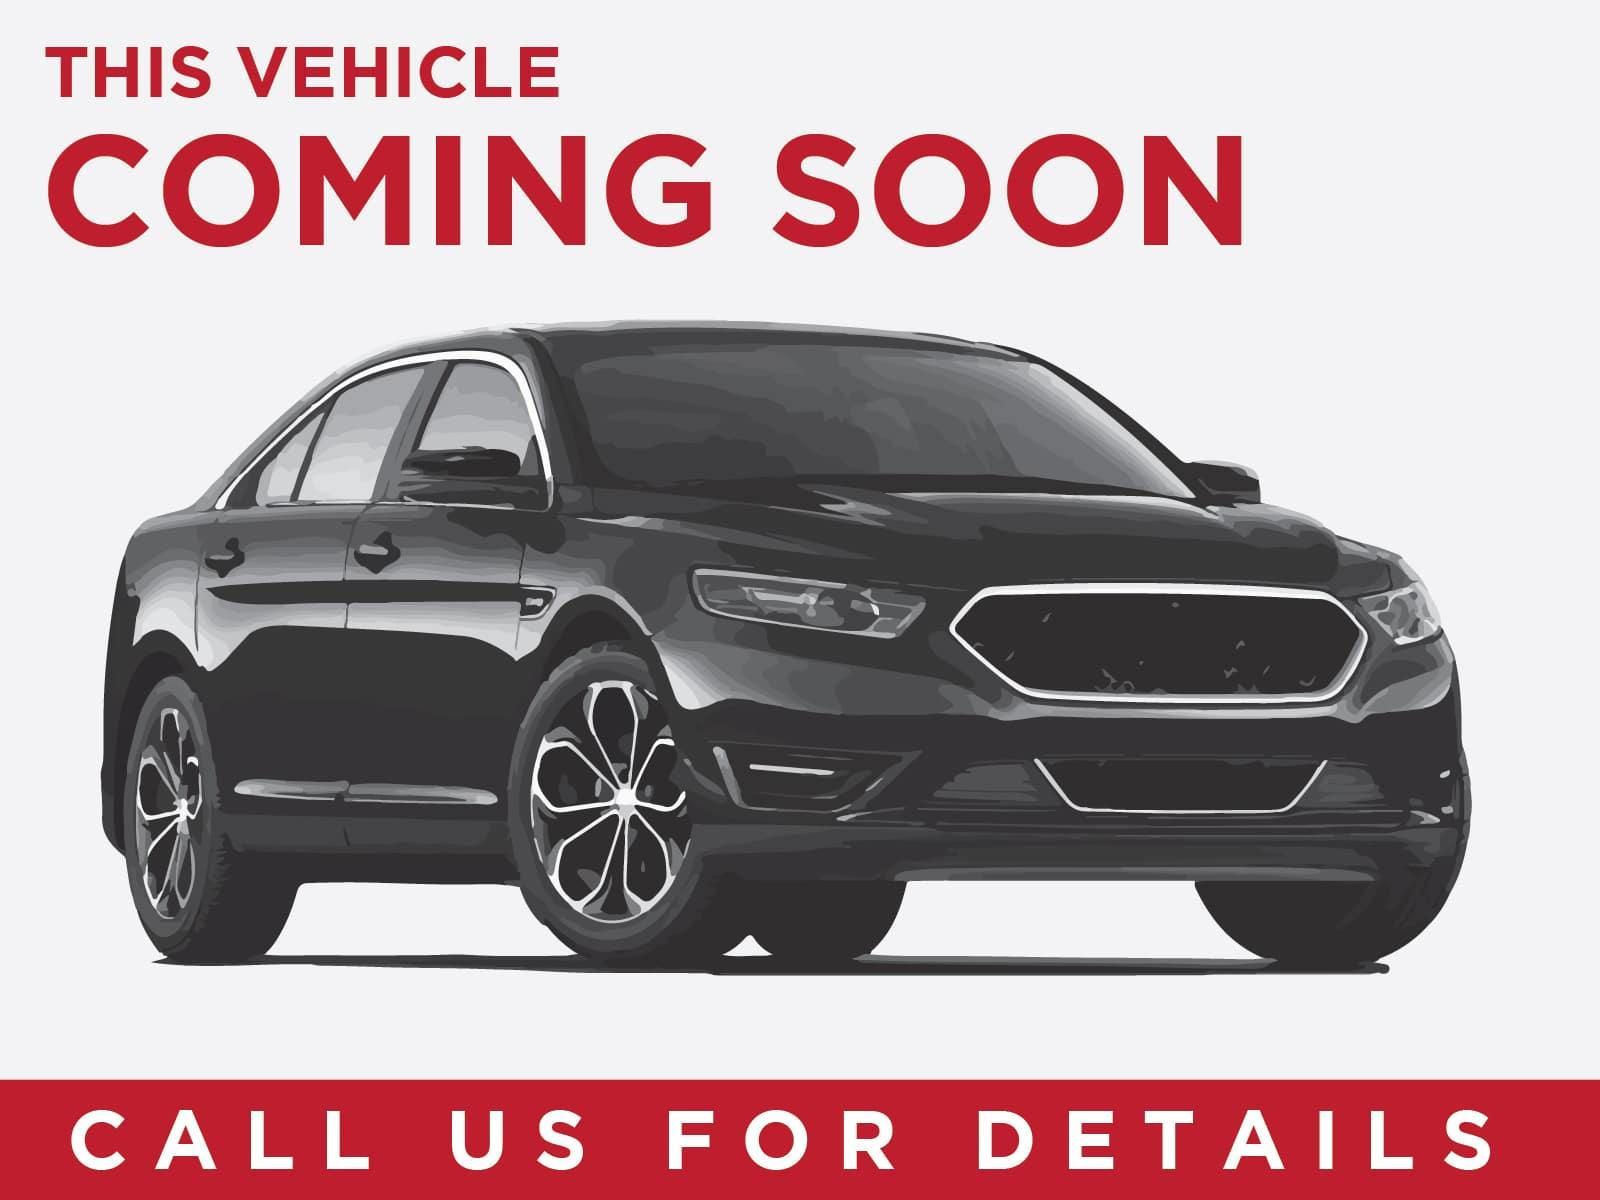 New Lexus Vehicles For Sale in Tucson